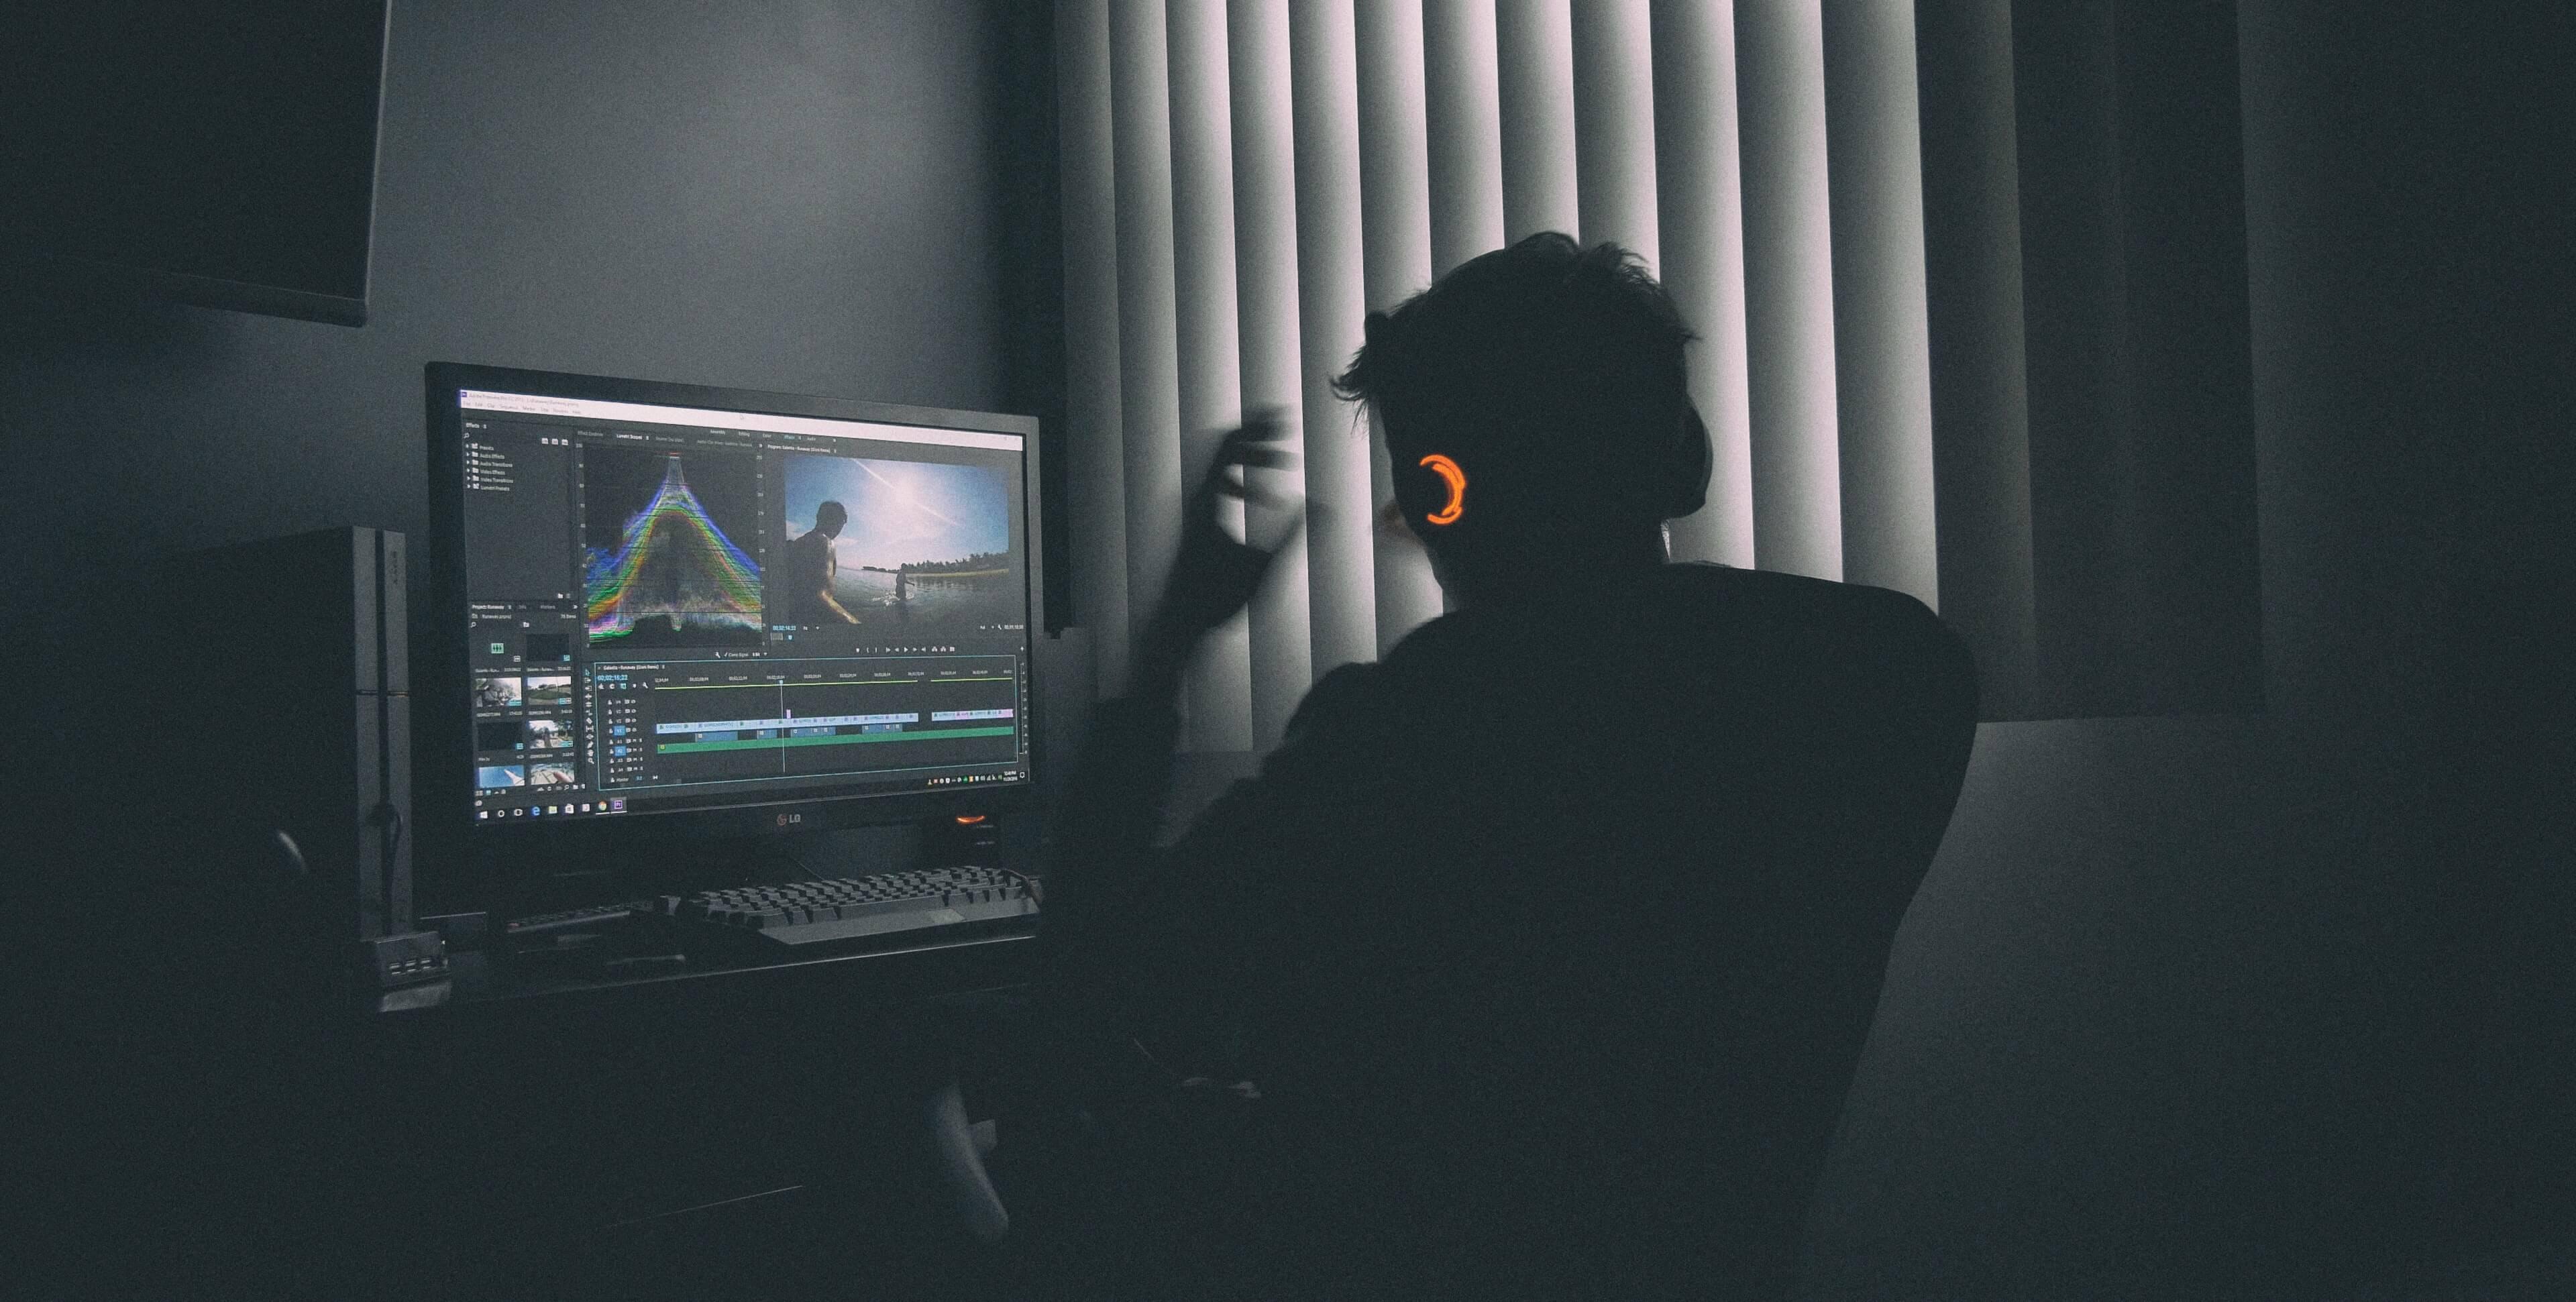 Gamer in darkened room